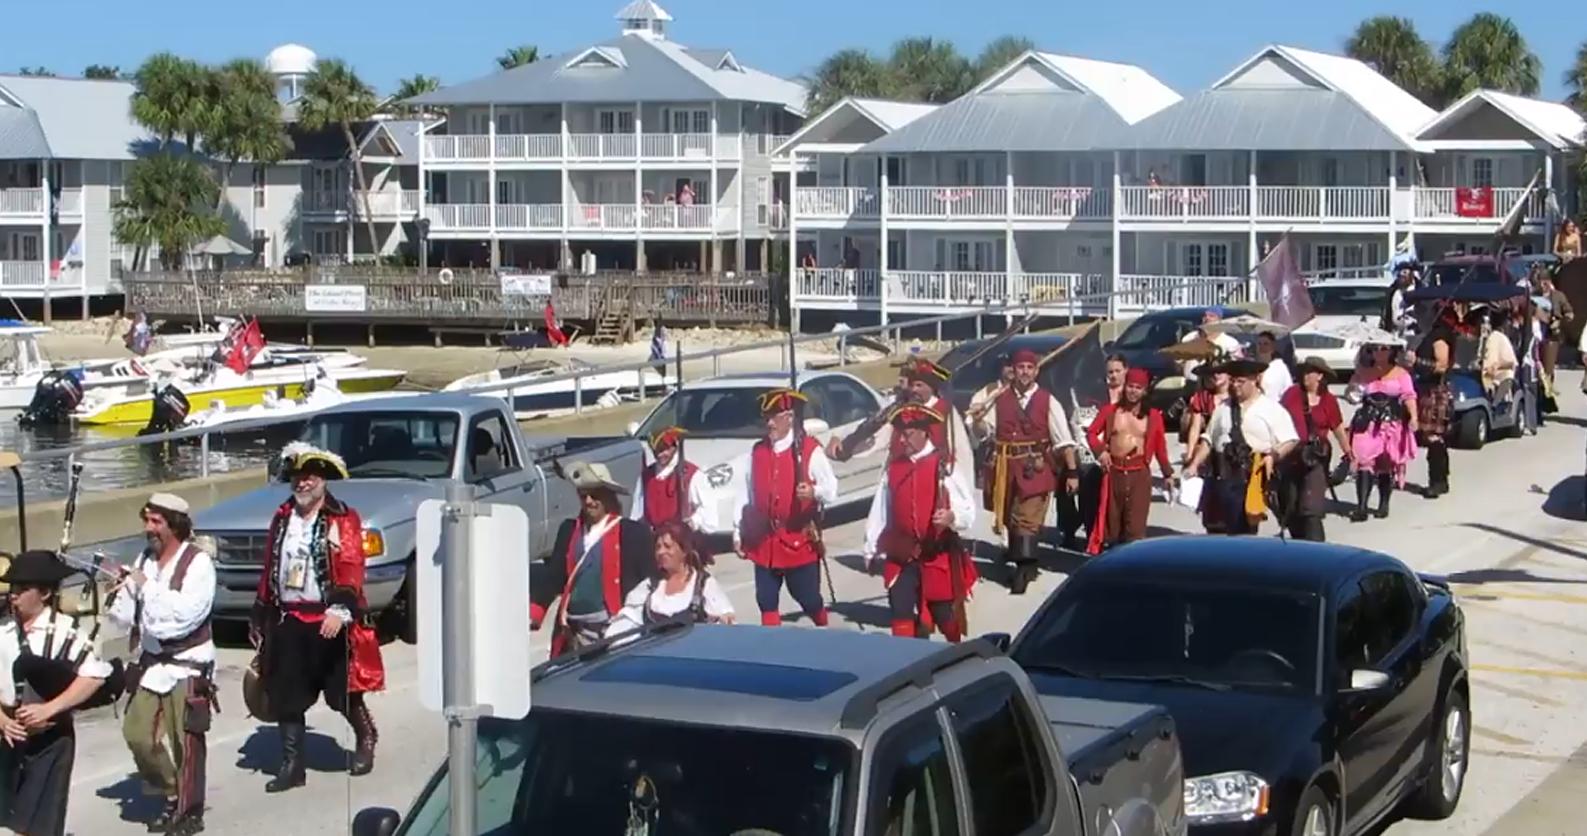 Pirate Parade Dock Street